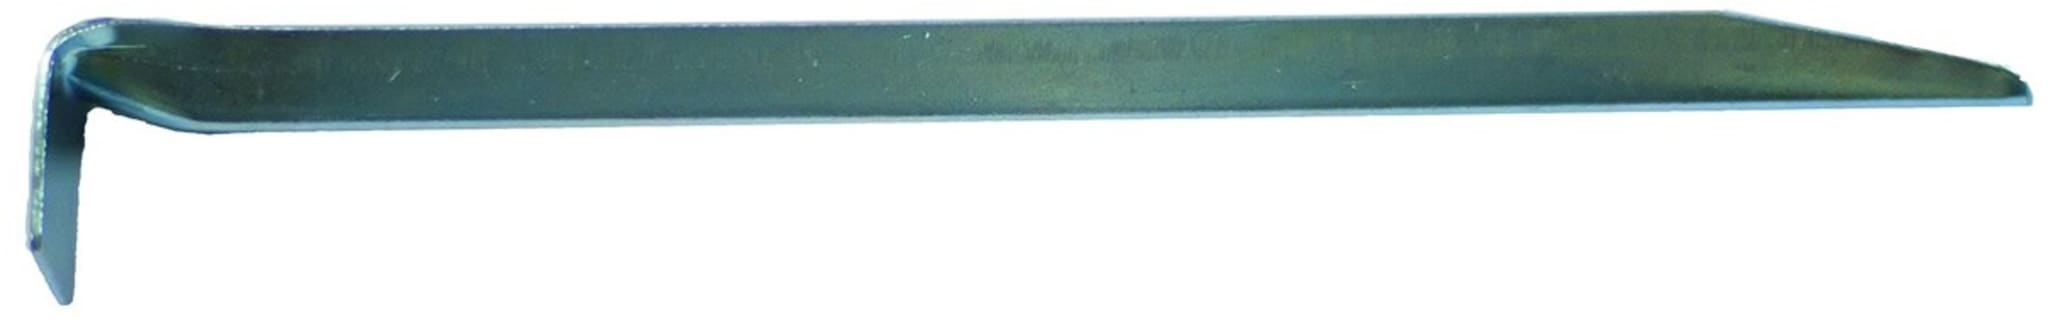 Stålplugger 18cm 10stk